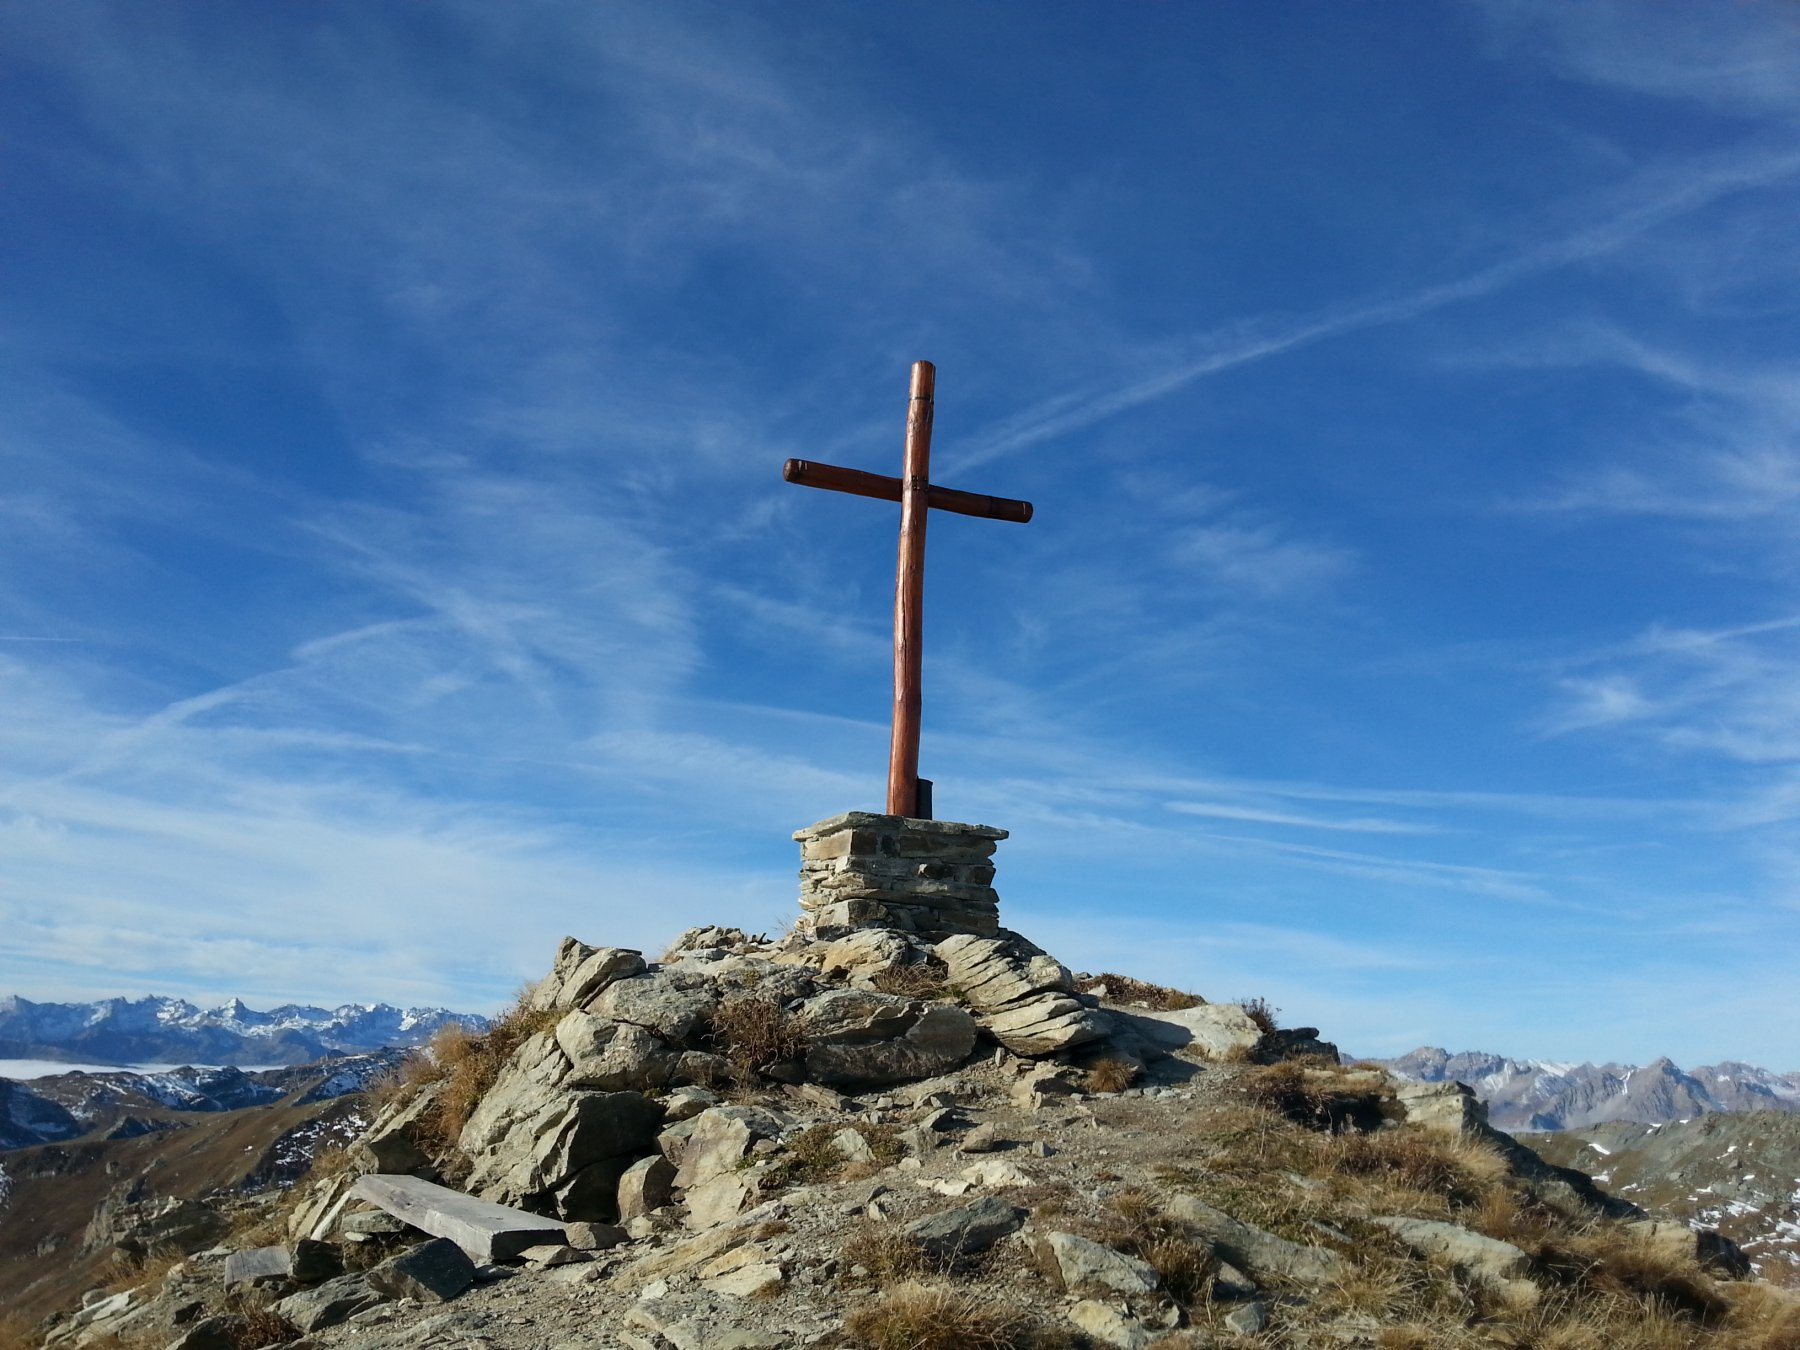 Tibert, Sibolet, Pelvo, Fauniera, Parvo (Cime) dal Santuario di San Magno, anello 2015-10-20